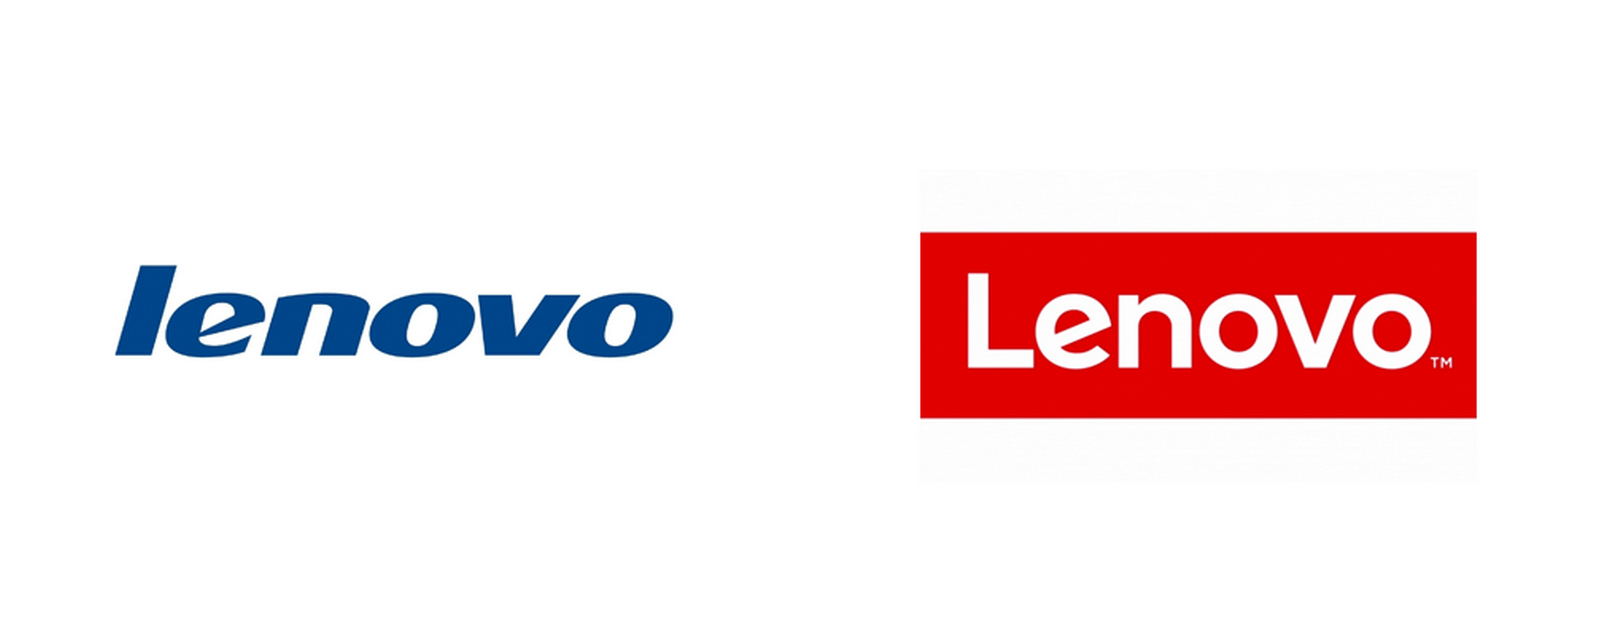 lenovo-old-new-logo